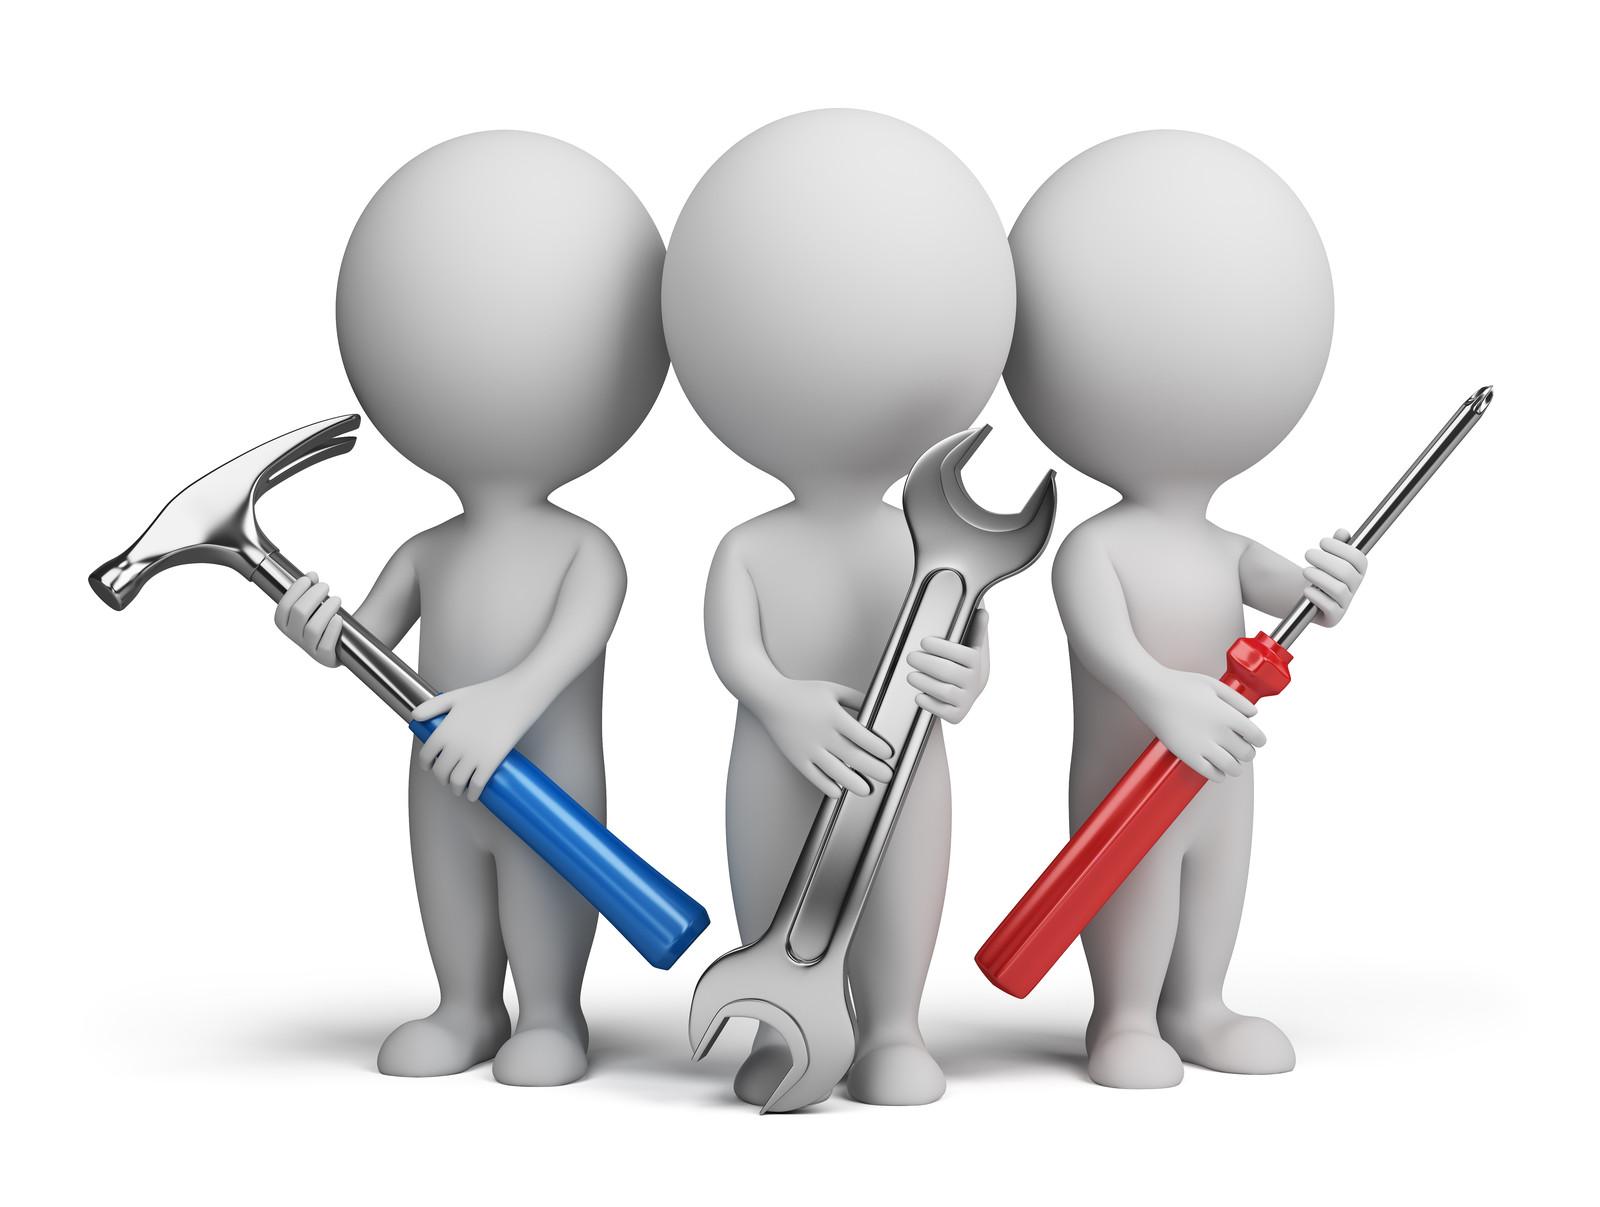 Maintenance clipart #1